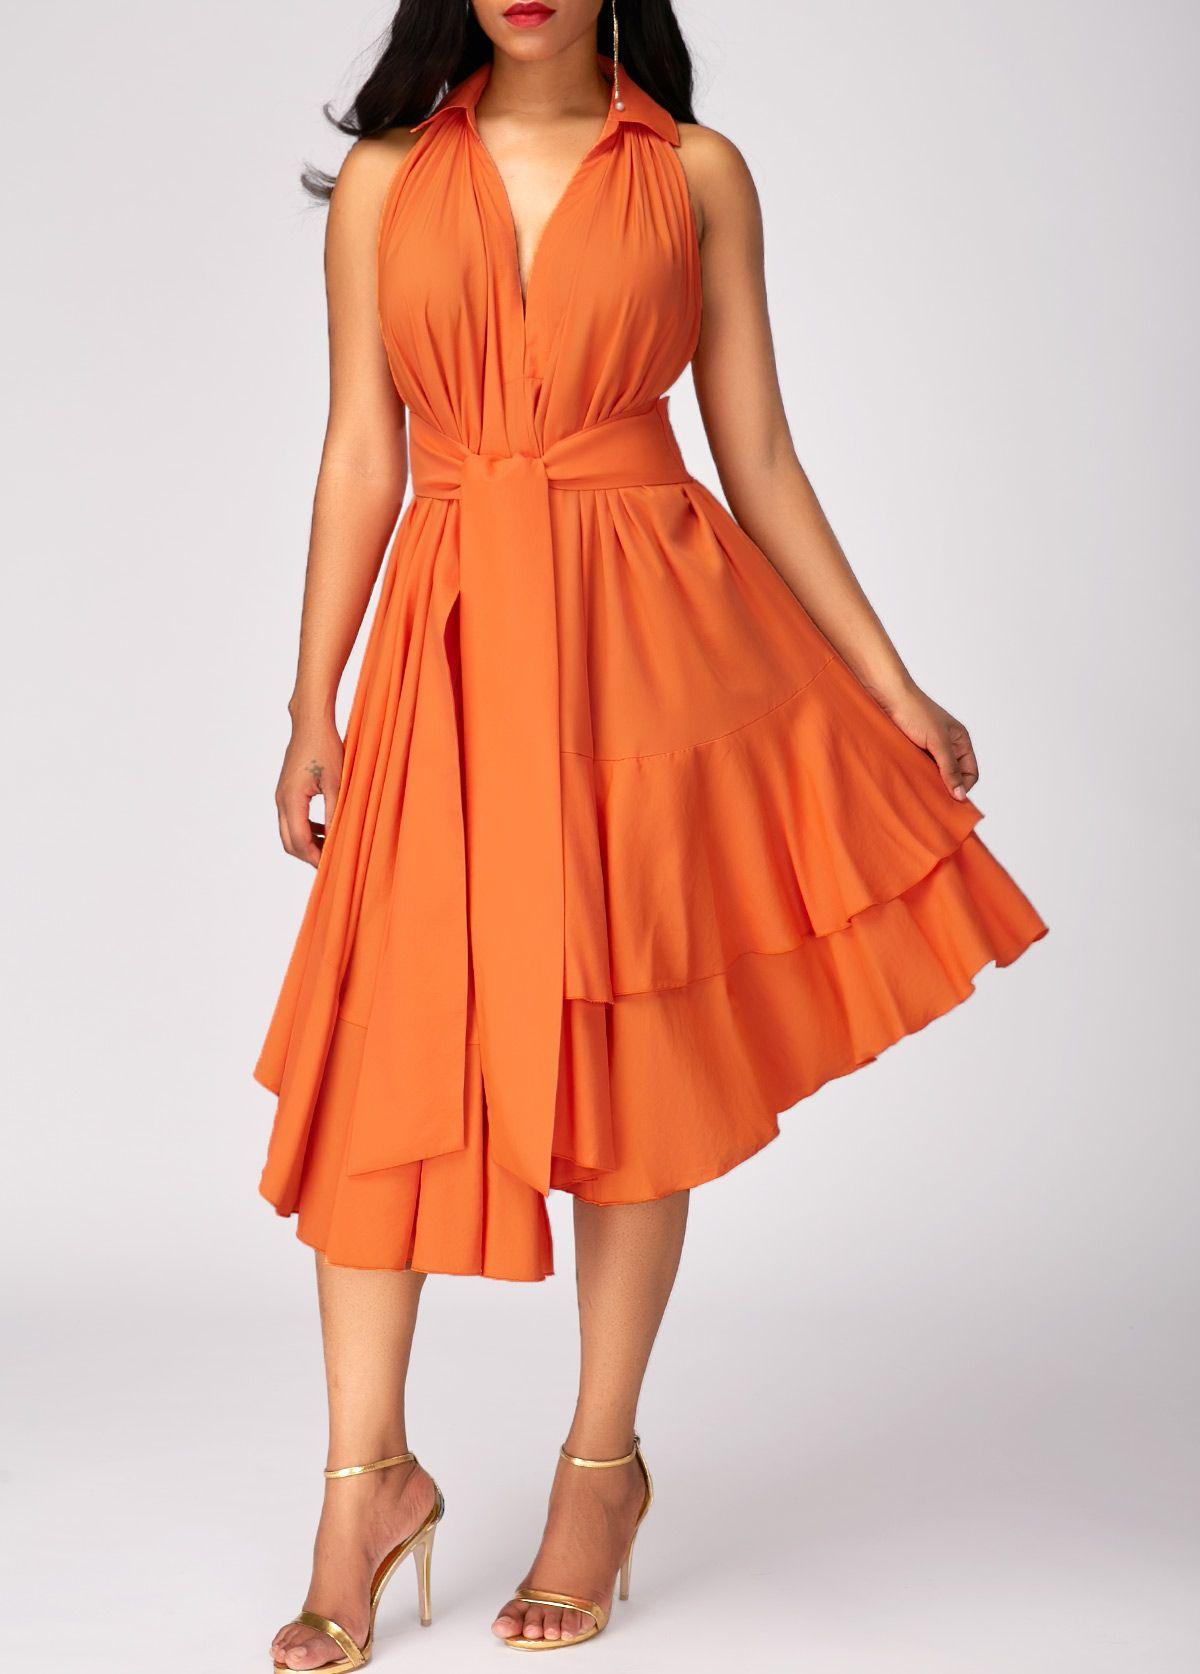 Asymmetric Hem High Waist Layered Orange Dress Rotita Com Usd 30 58 Orange Dress Dresses Party Dress Long [ 1674 x 1200 Pixel ]